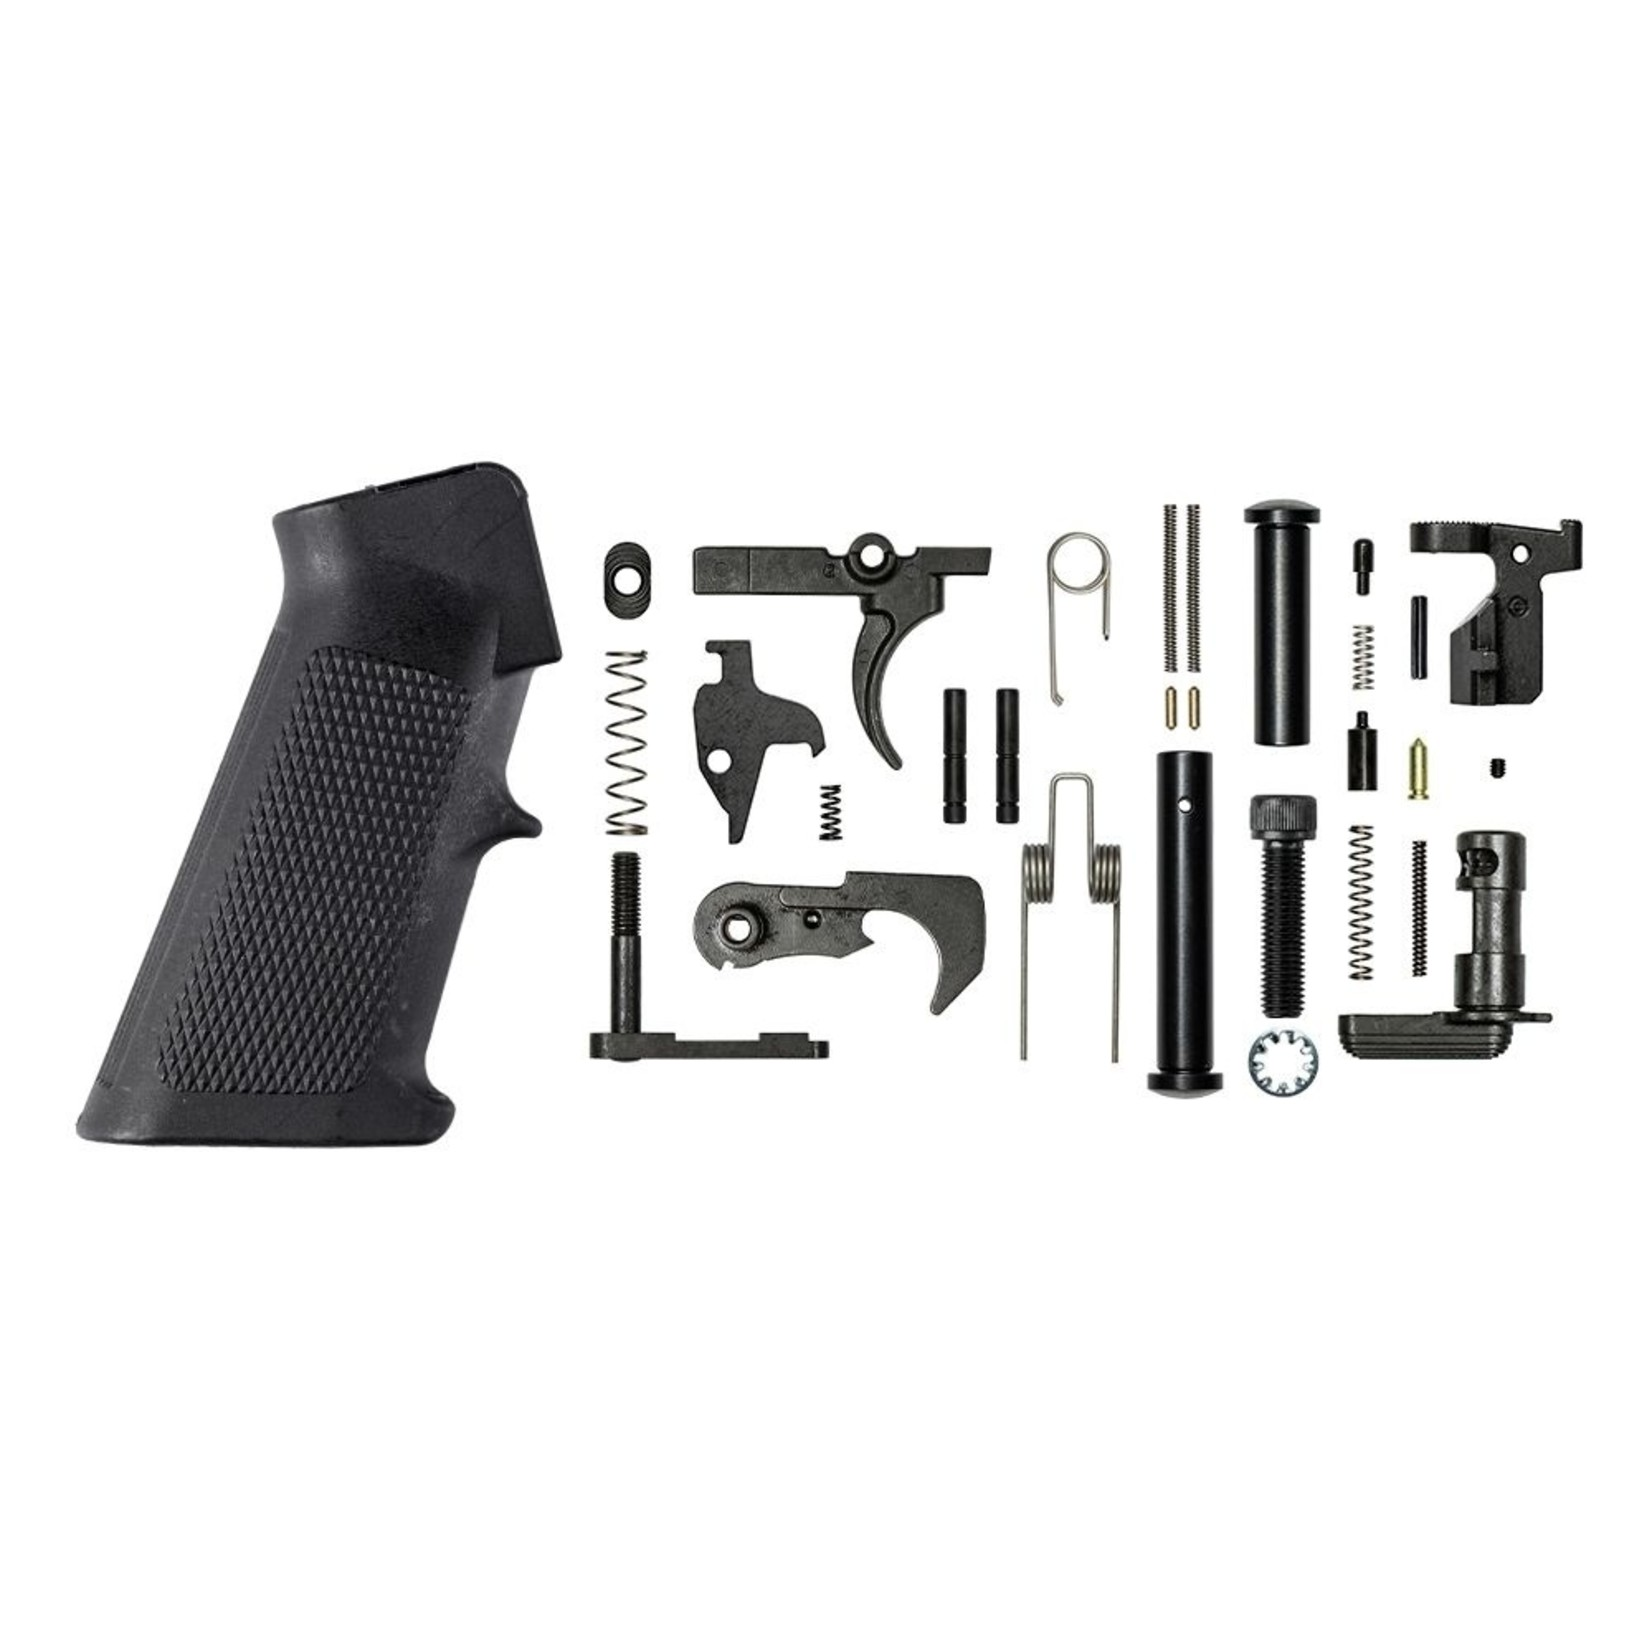 Aero M5 Standard Lower Parts Kit, Aero Precision